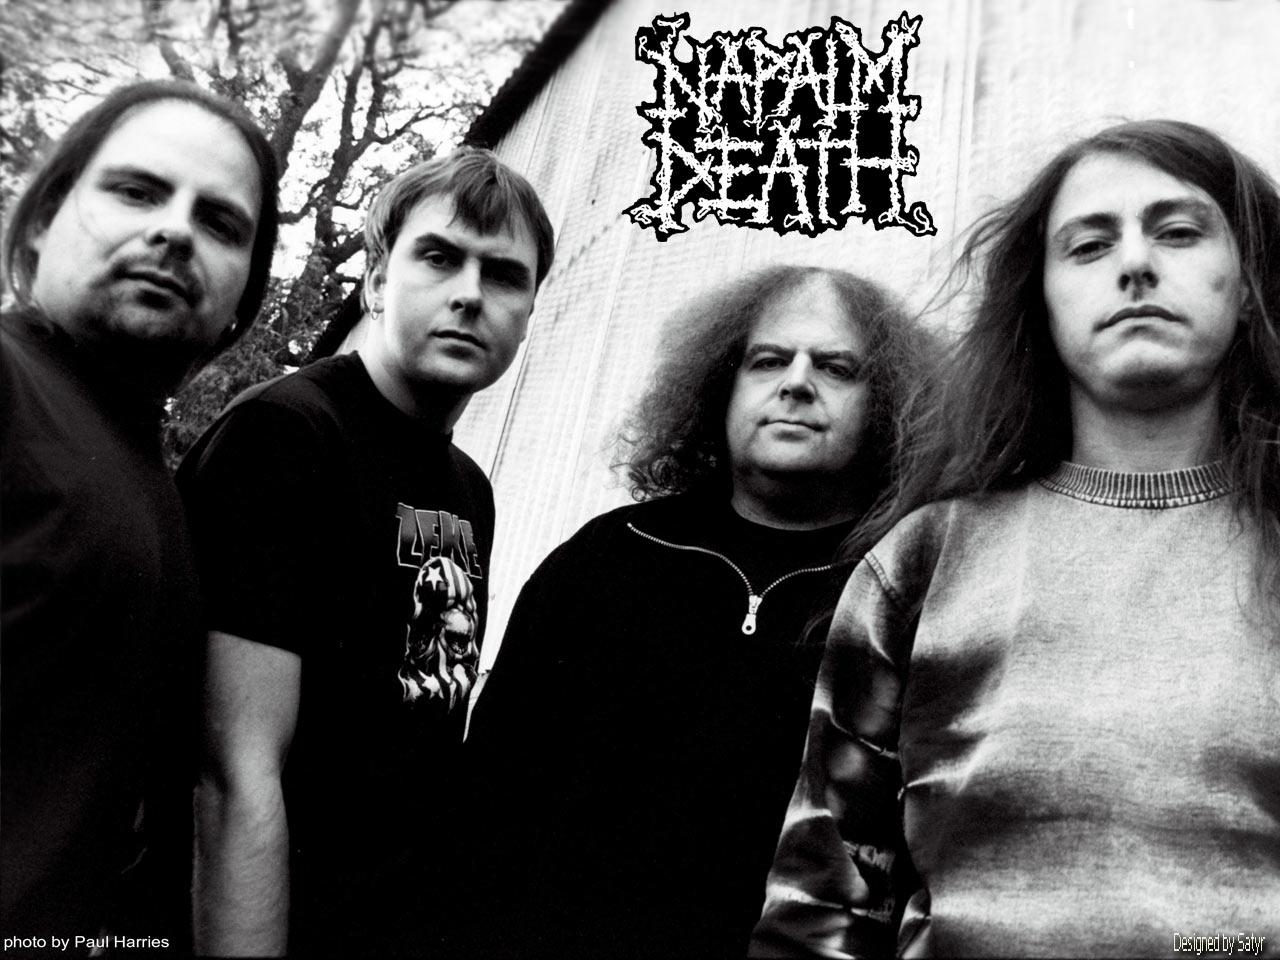 napalm death  - napalm death - Napalm Death – live @ hellfest 2012